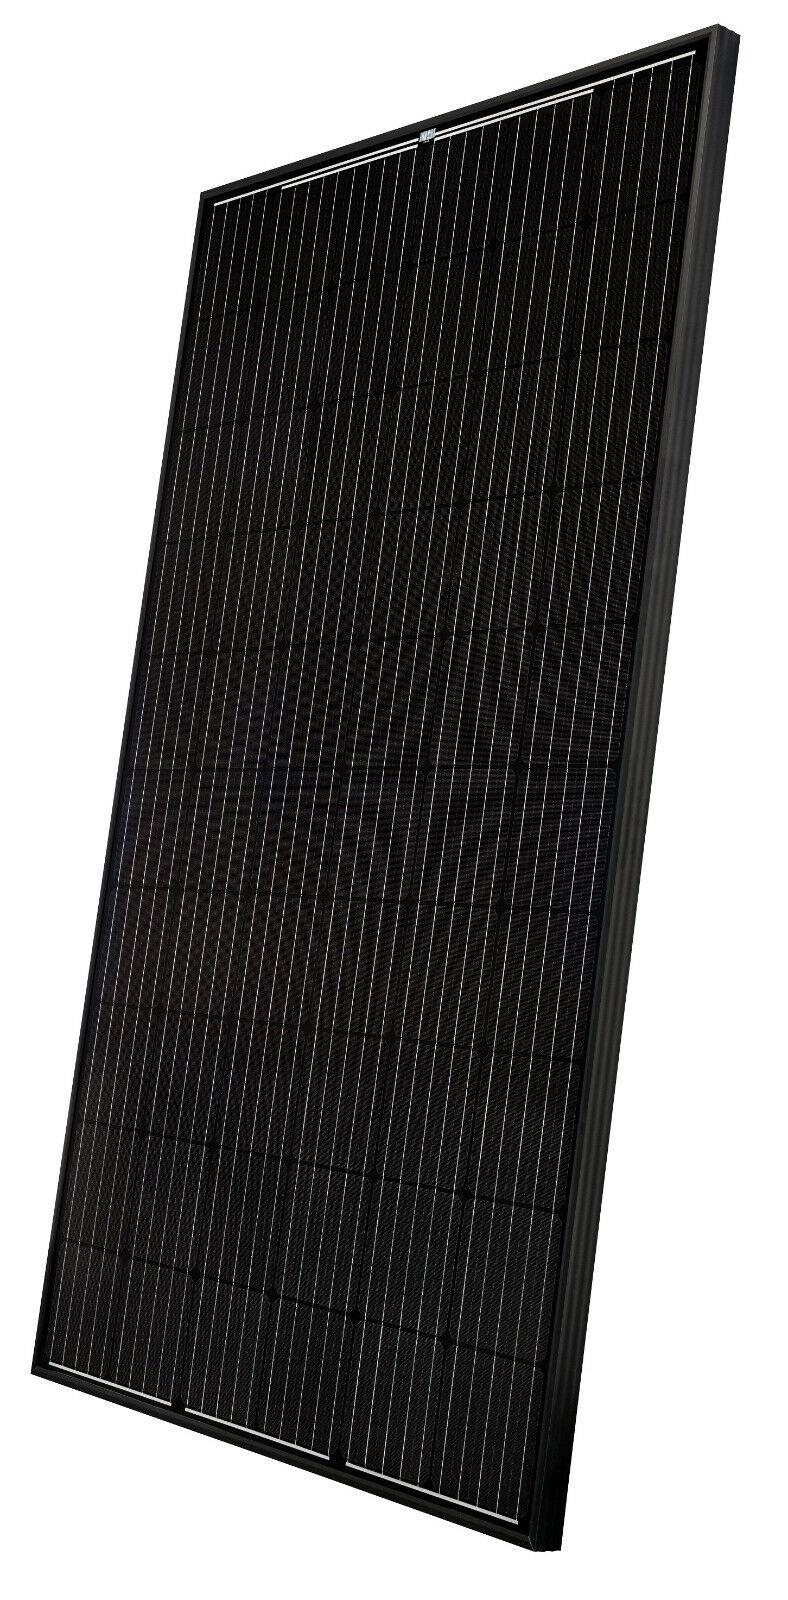 Solarpanel Black Seitlich